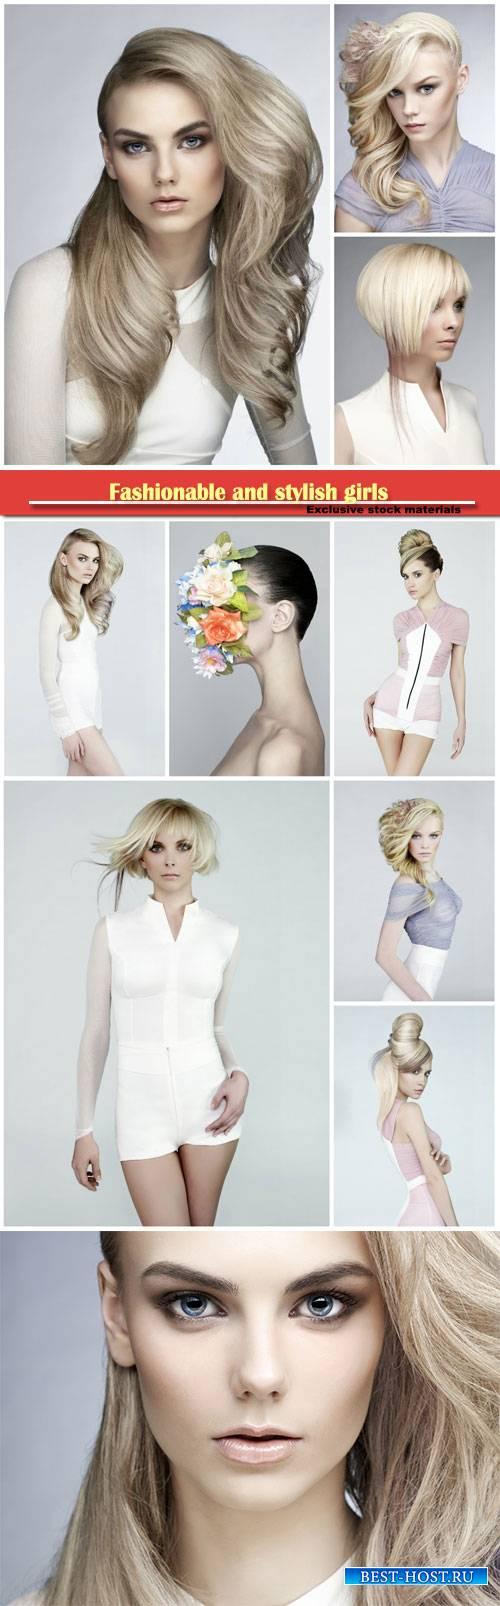 Fashionable and stylish girls